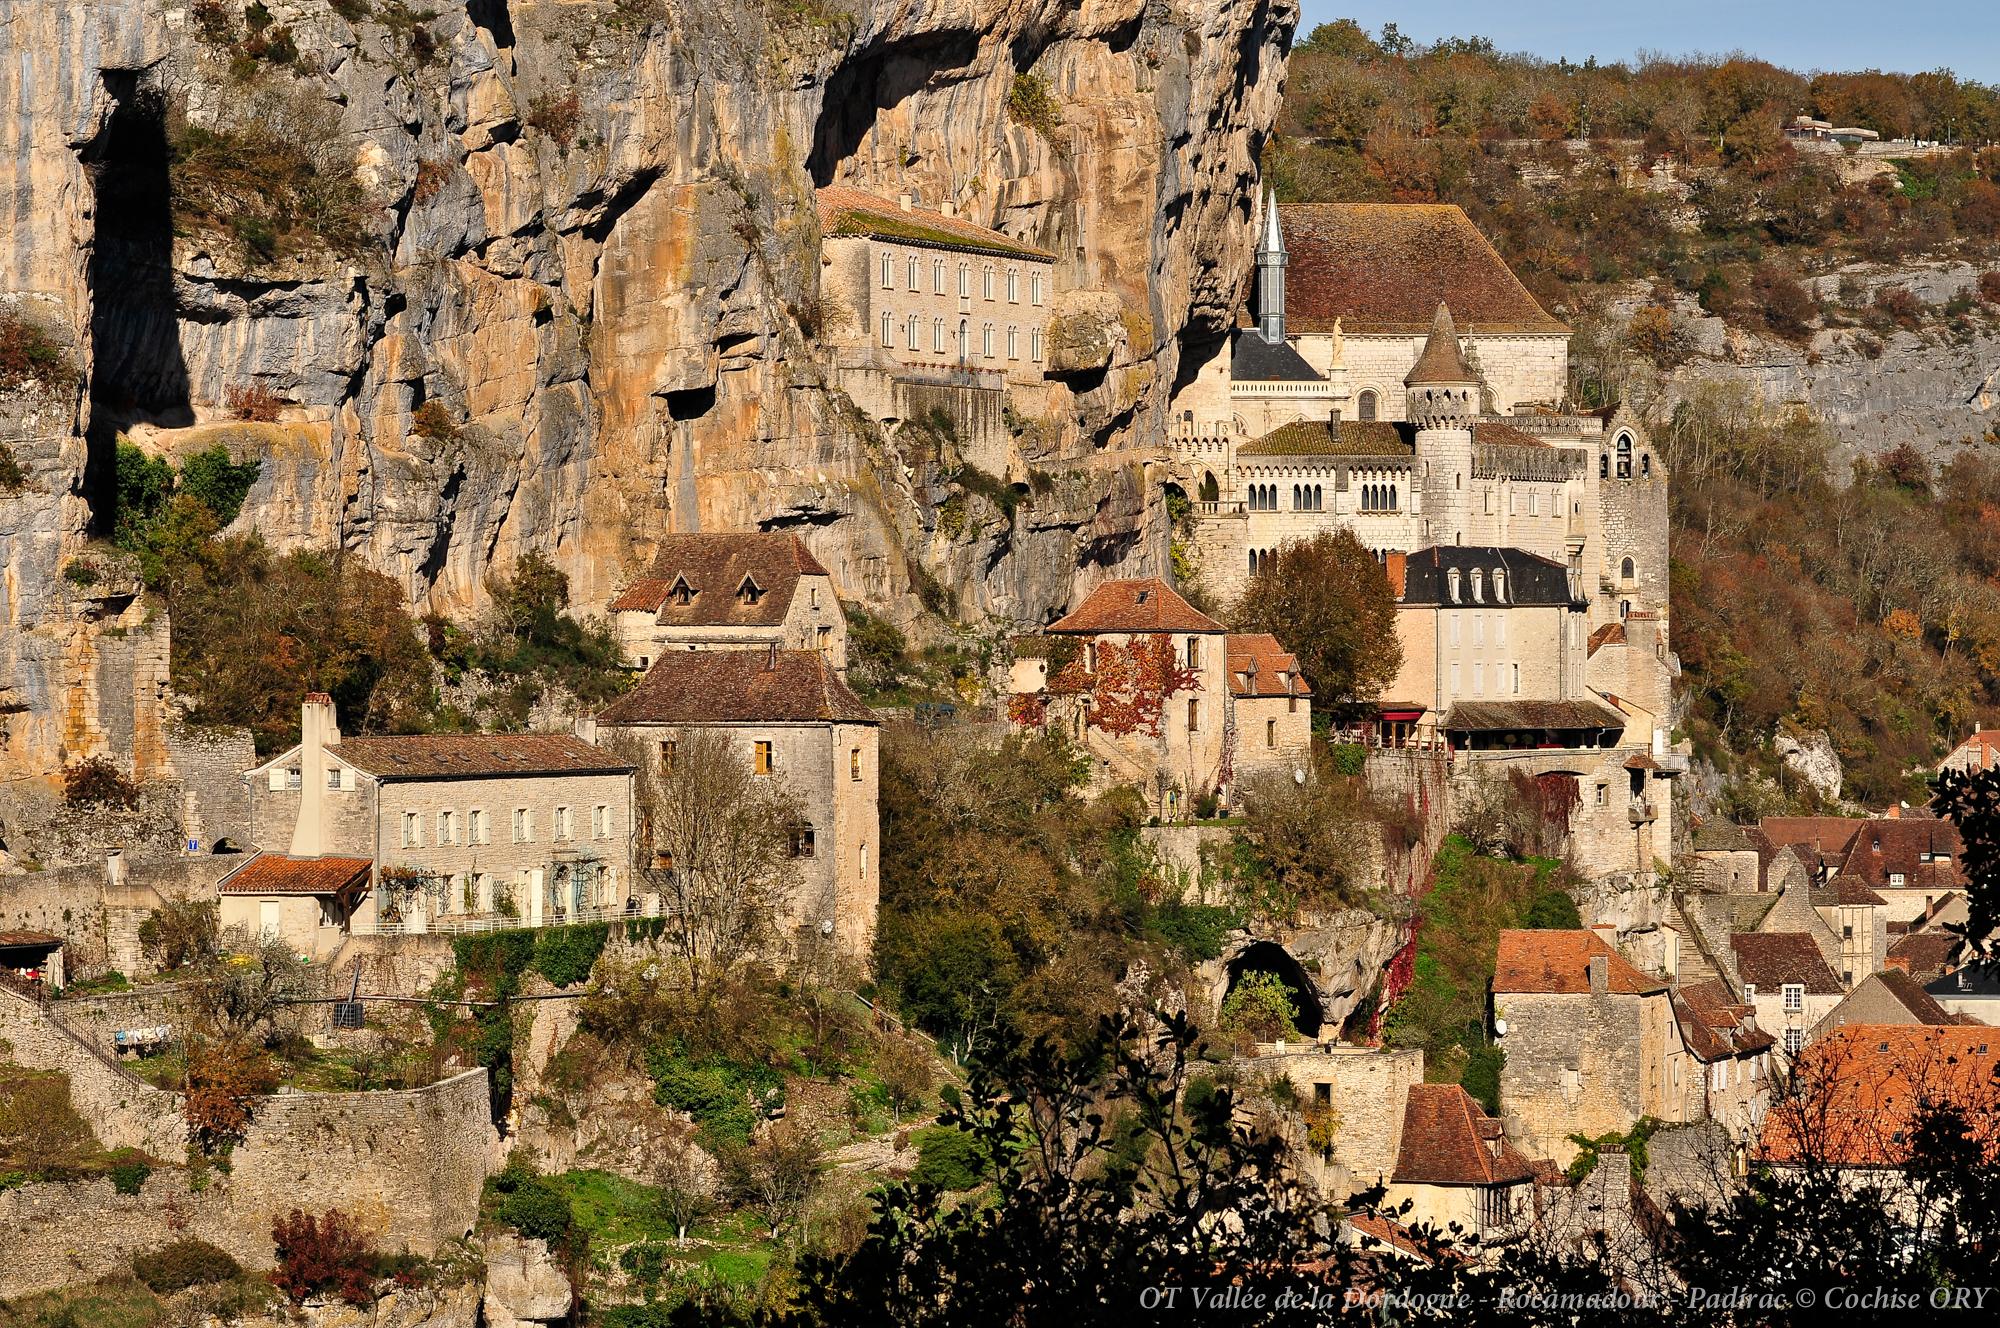 Le rocher de Rocamadour